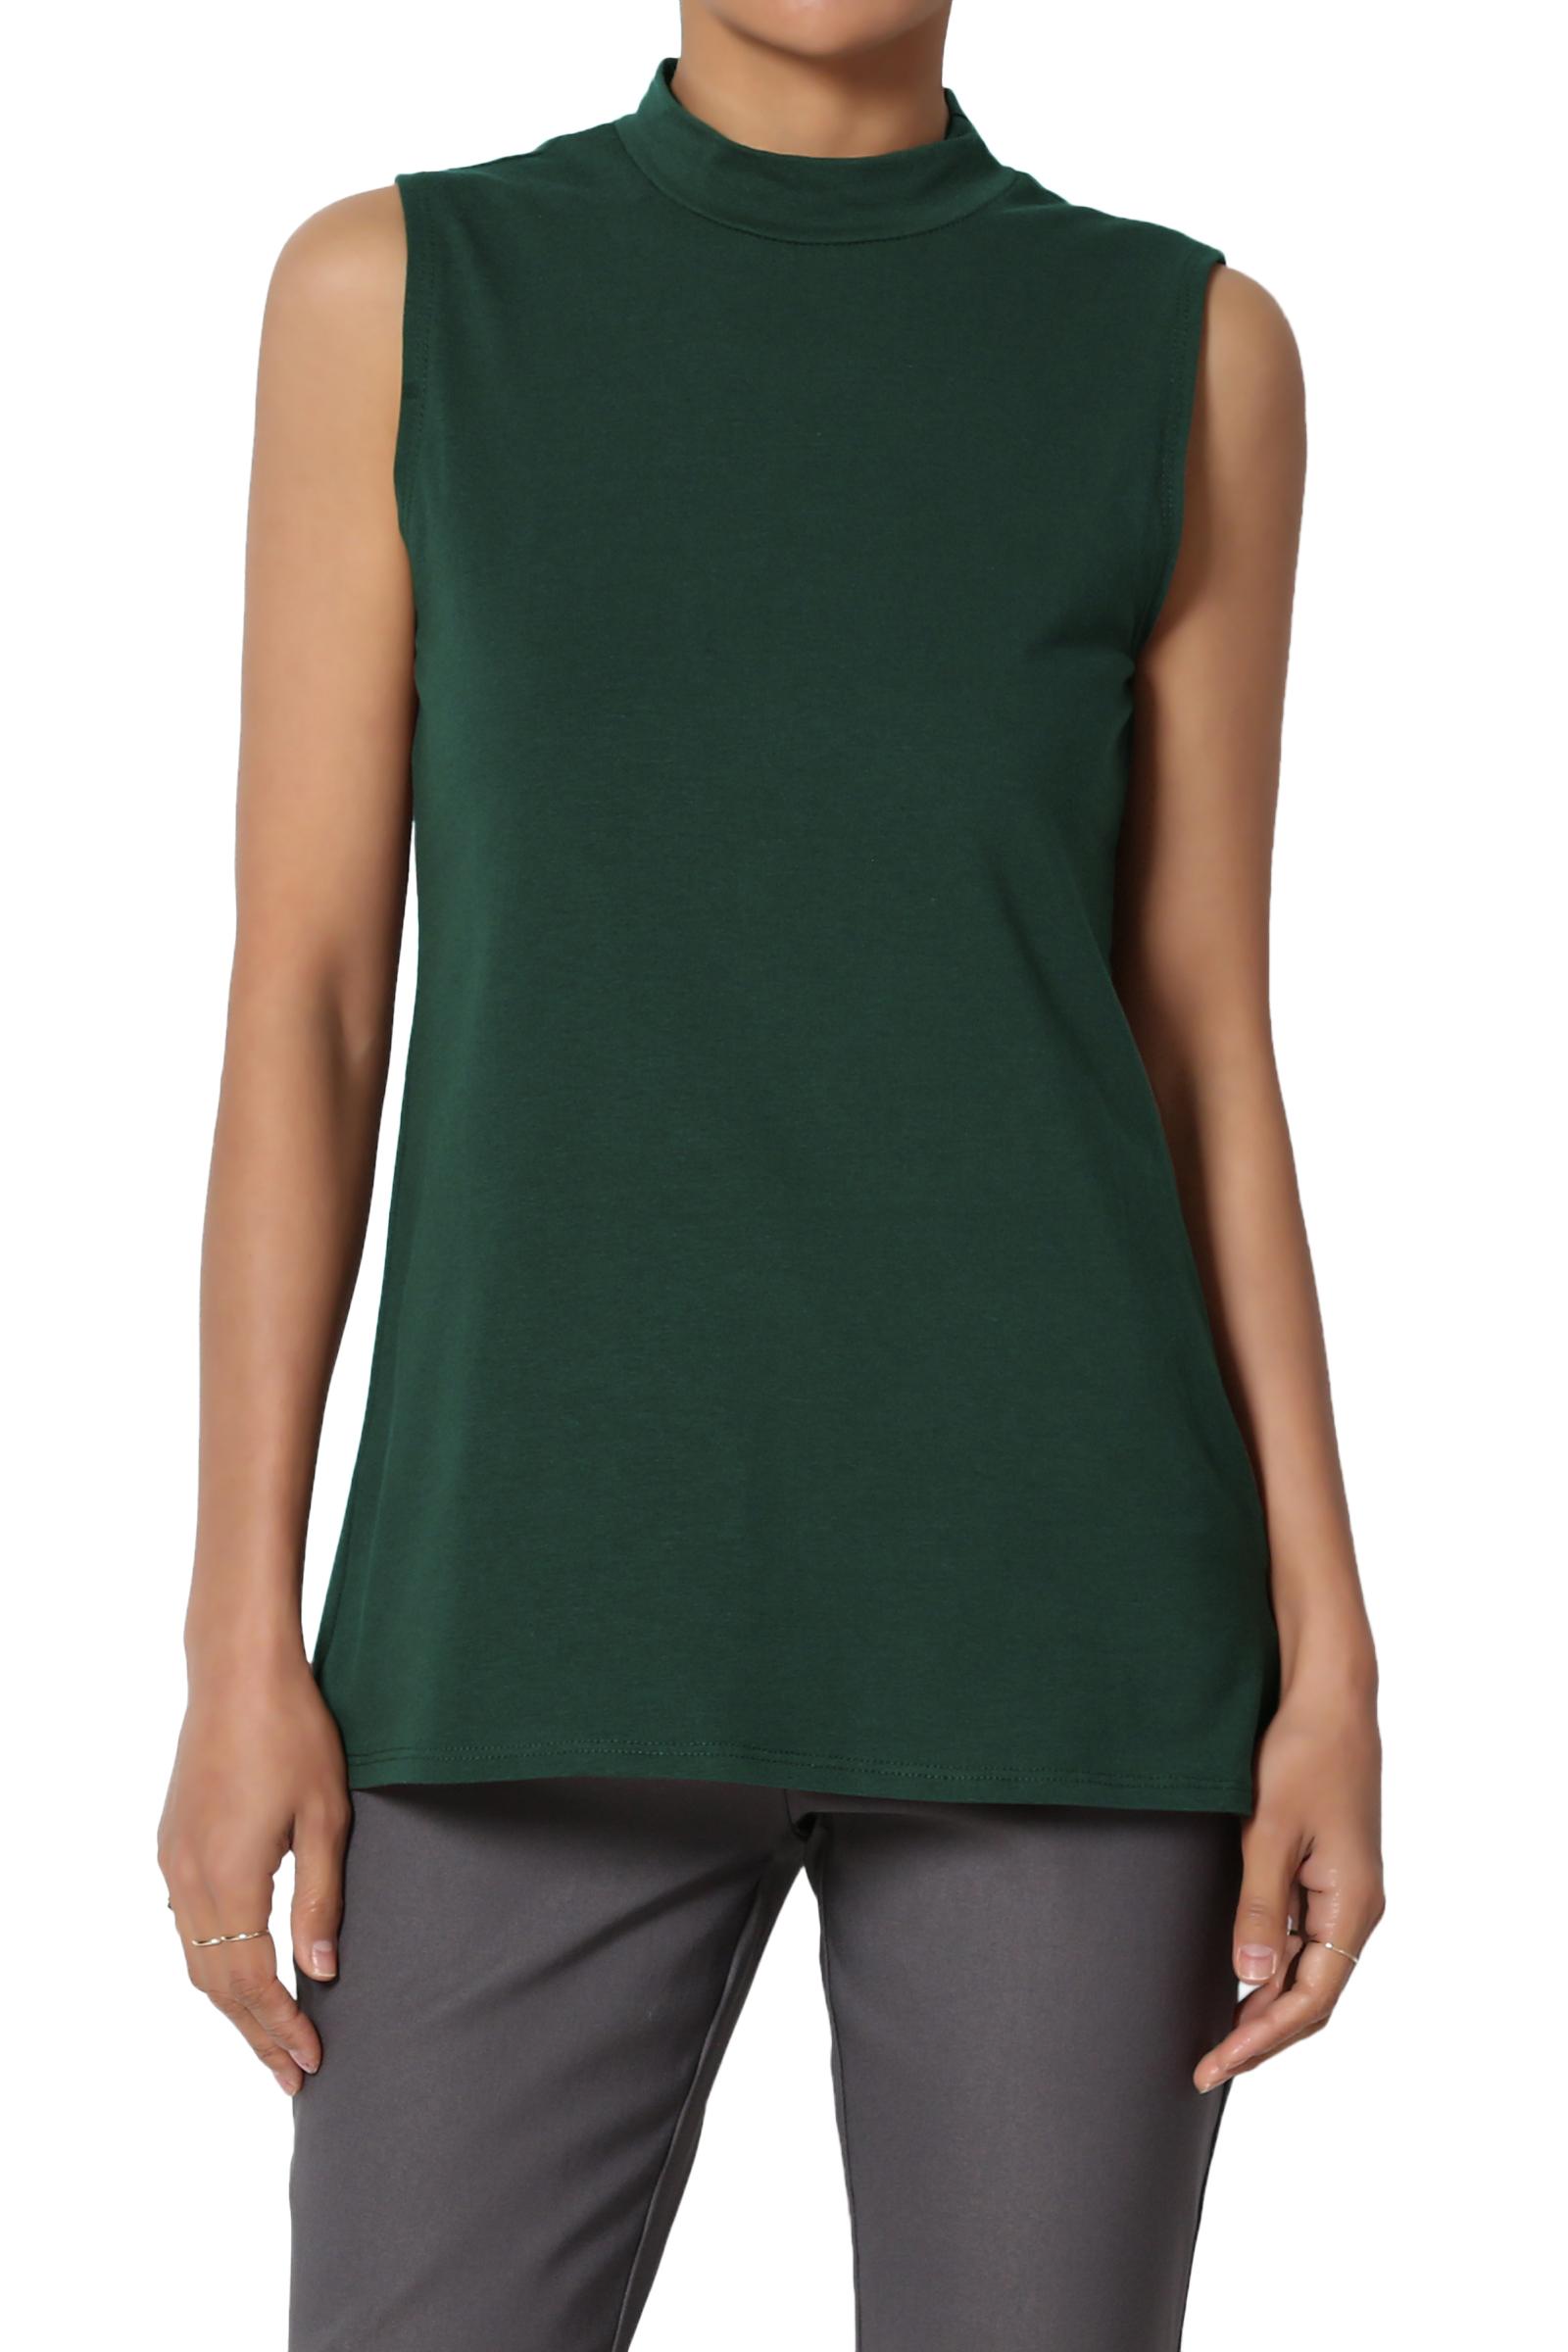 TheMogan Junior's PLUS Mock Neck Sleeveless T-Shirt Stretch Cotton Slim Fit Tank Top